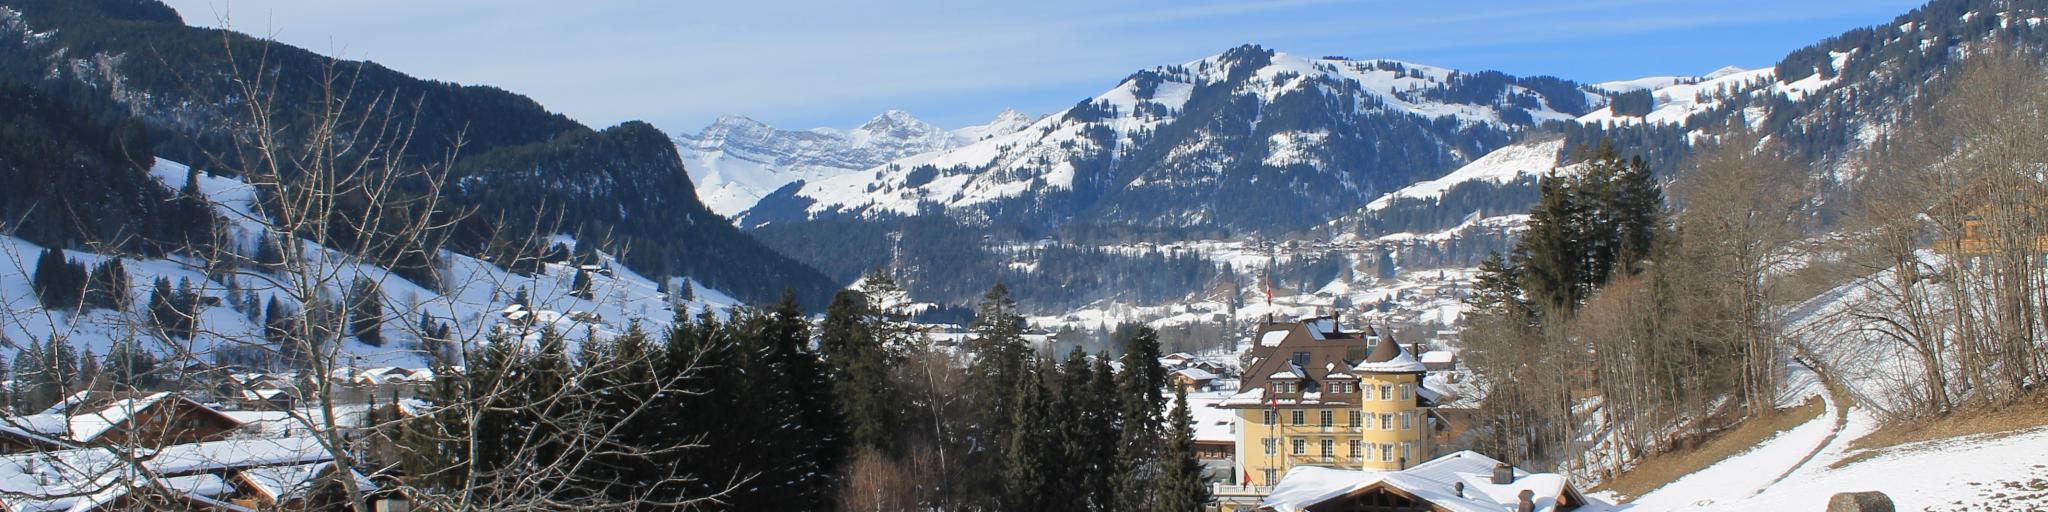 A bench overlooks the snowy ski resort town of Gstaad, Switzerland